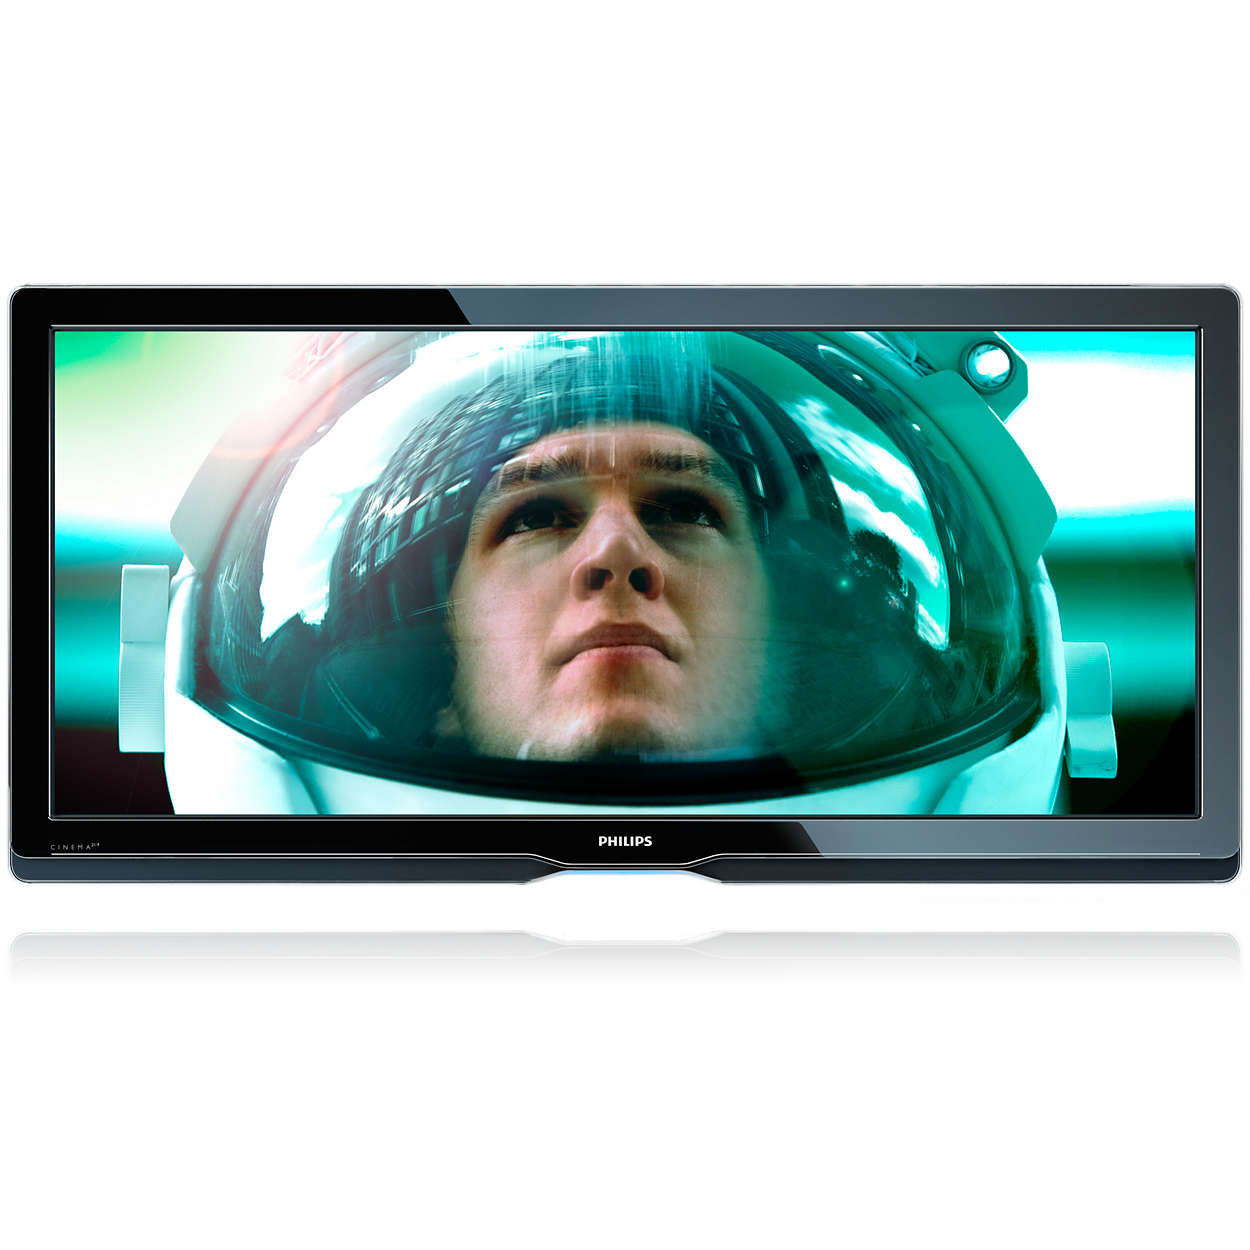 Cinema 21:9 LCD TV 56PFL9954H/12 | Philips